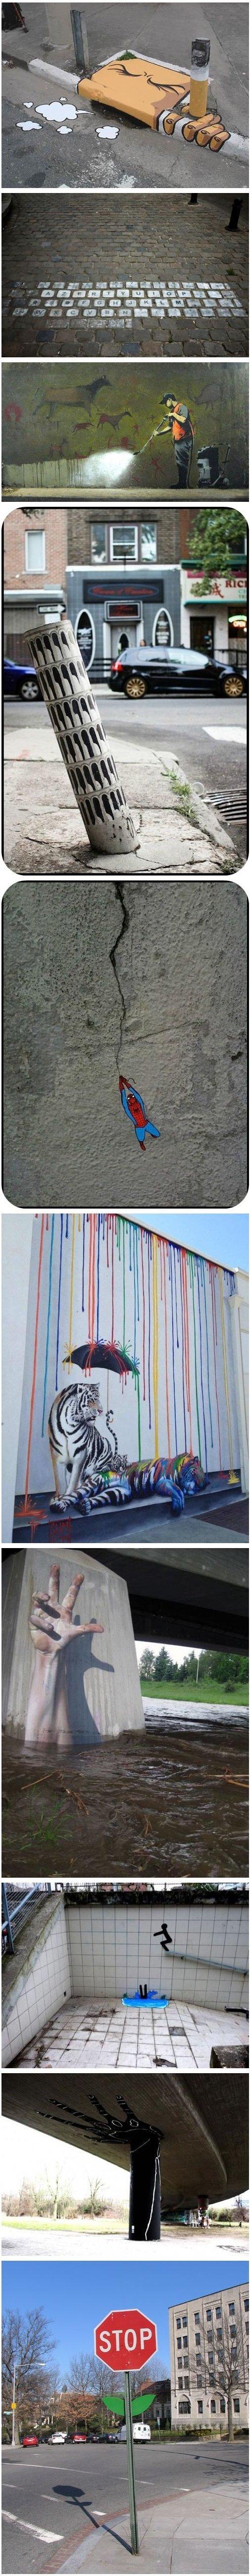 creative street art. . creative street art